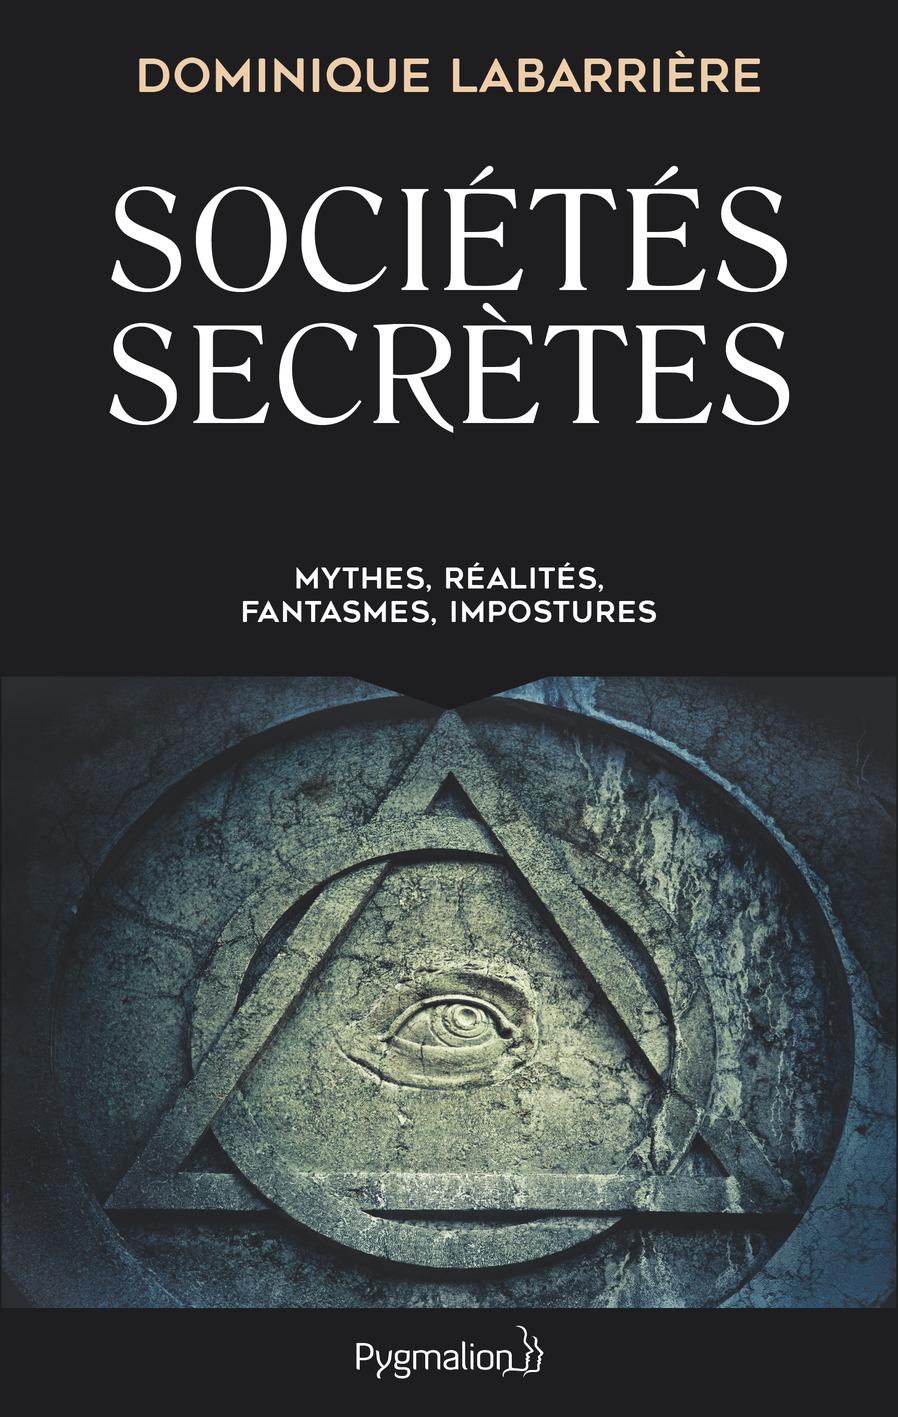 Sociétés secrètes. Mythes, réalités, fanstasmes, impostures